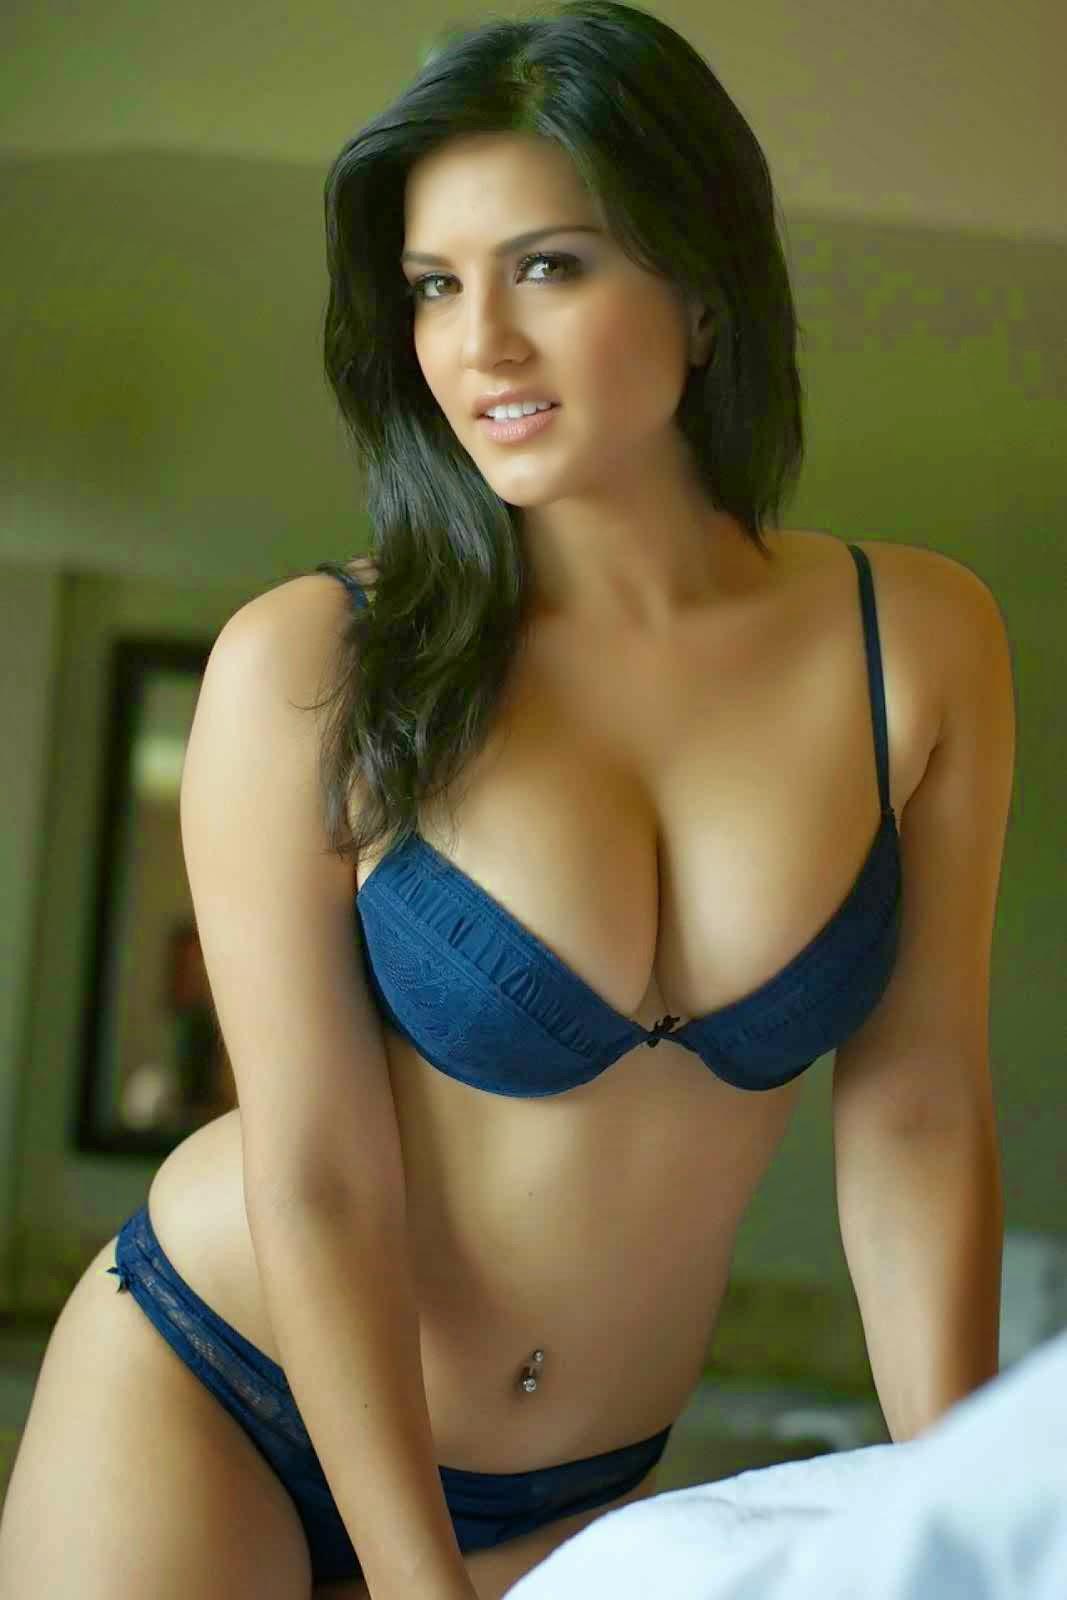 Tamanna Hd Wallpapers Free Download Sunny Leone Hot Hd Bikini Sexy Attractive Photos And